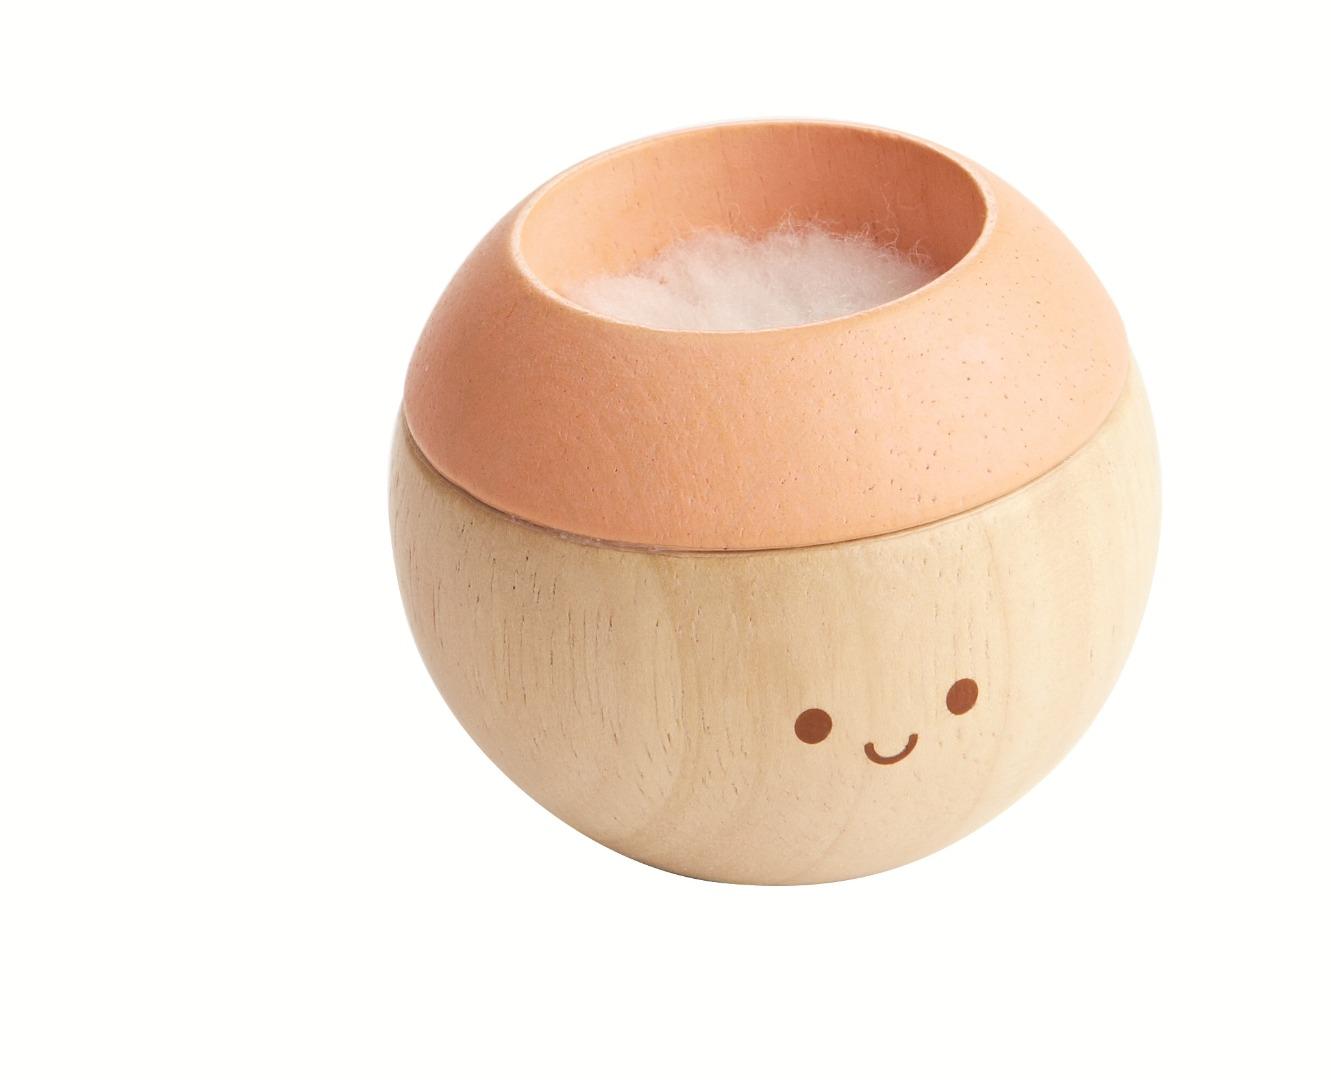 PlanToys Fühlspass Sensorig Spielzeug 7